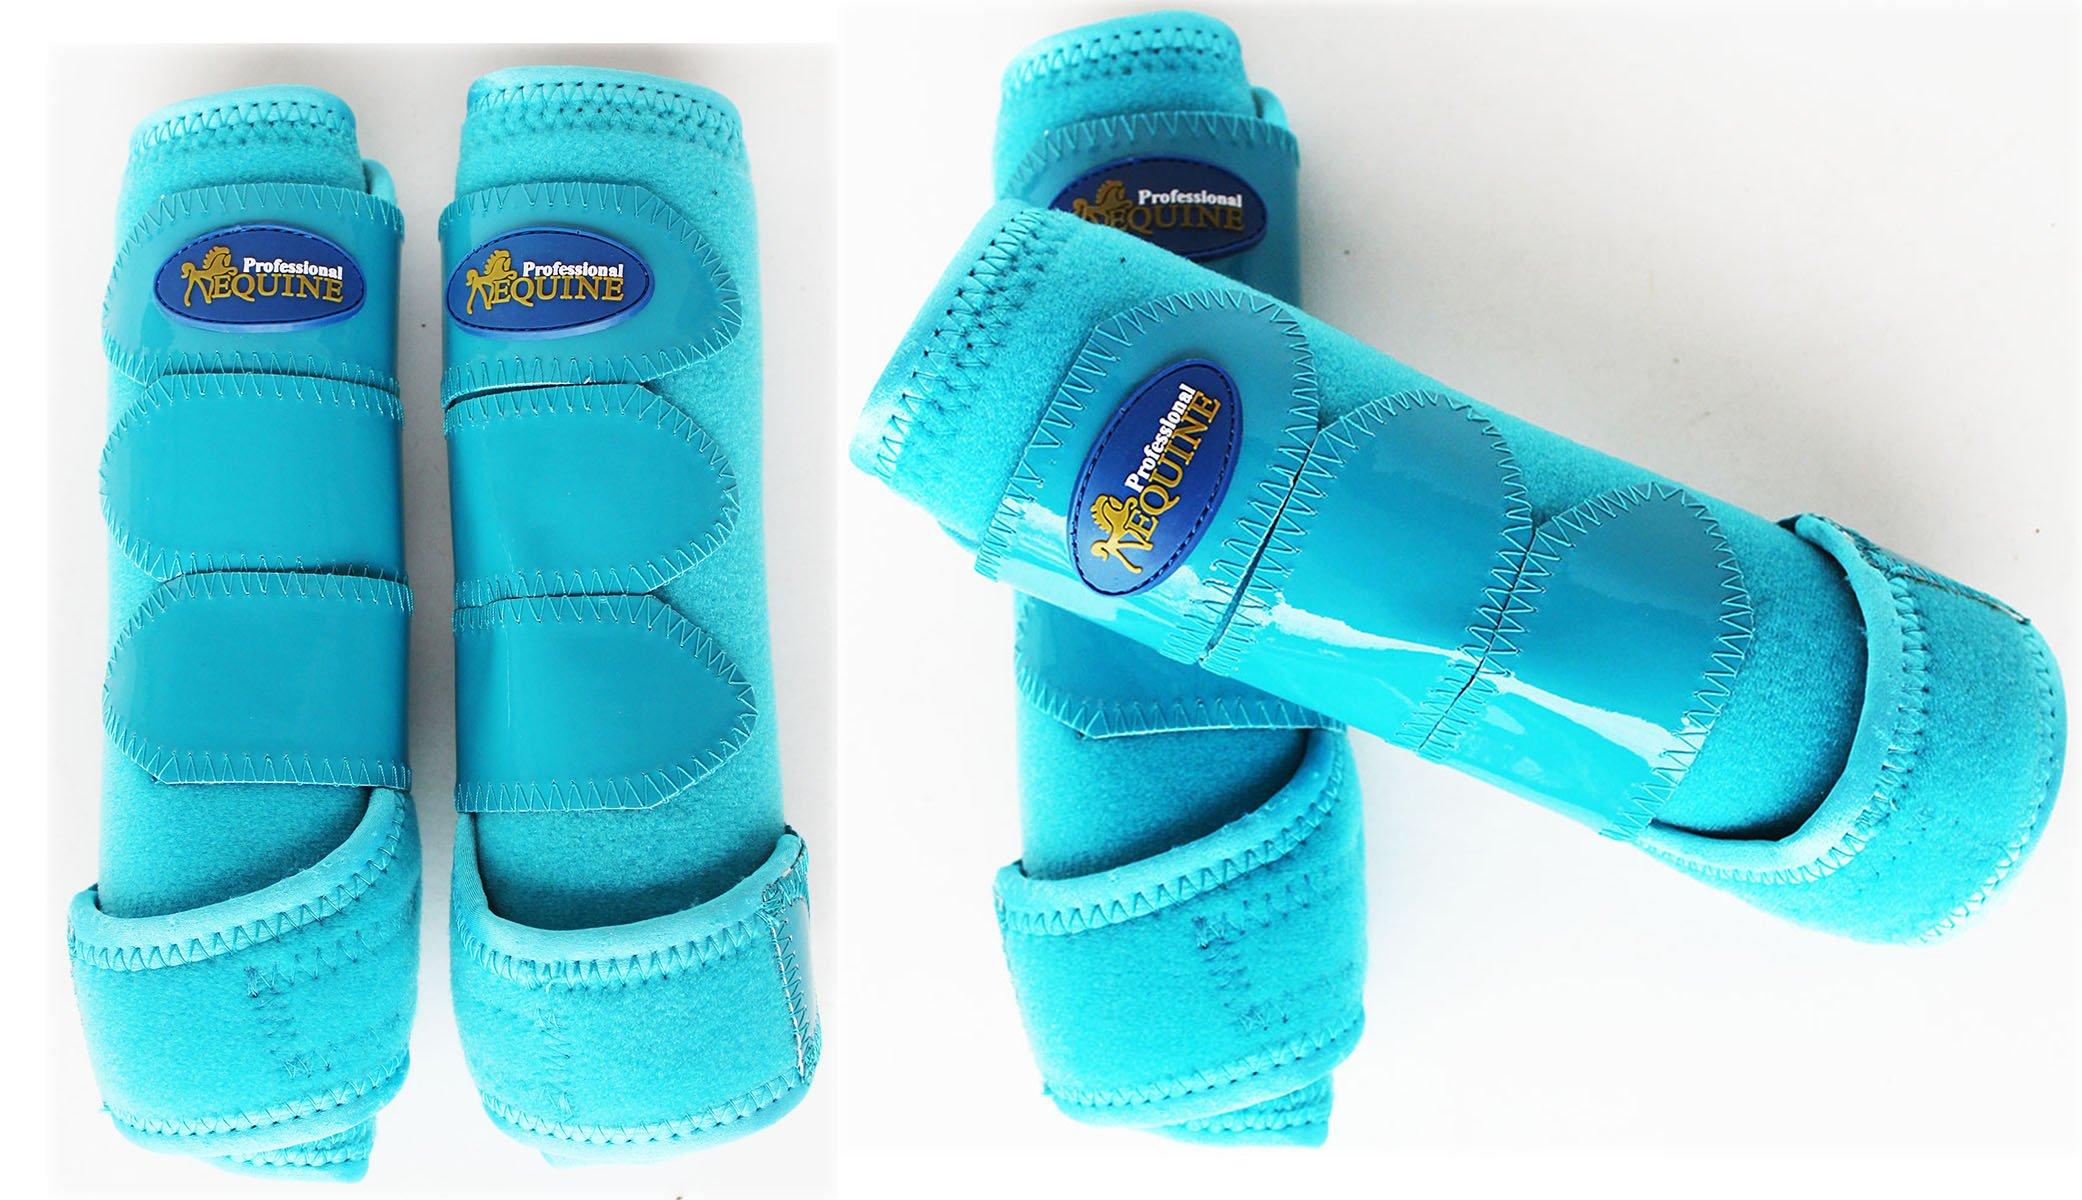 Professional Equine Horse Medium 4-Pack Sports Medicine Splint Boots 4150C